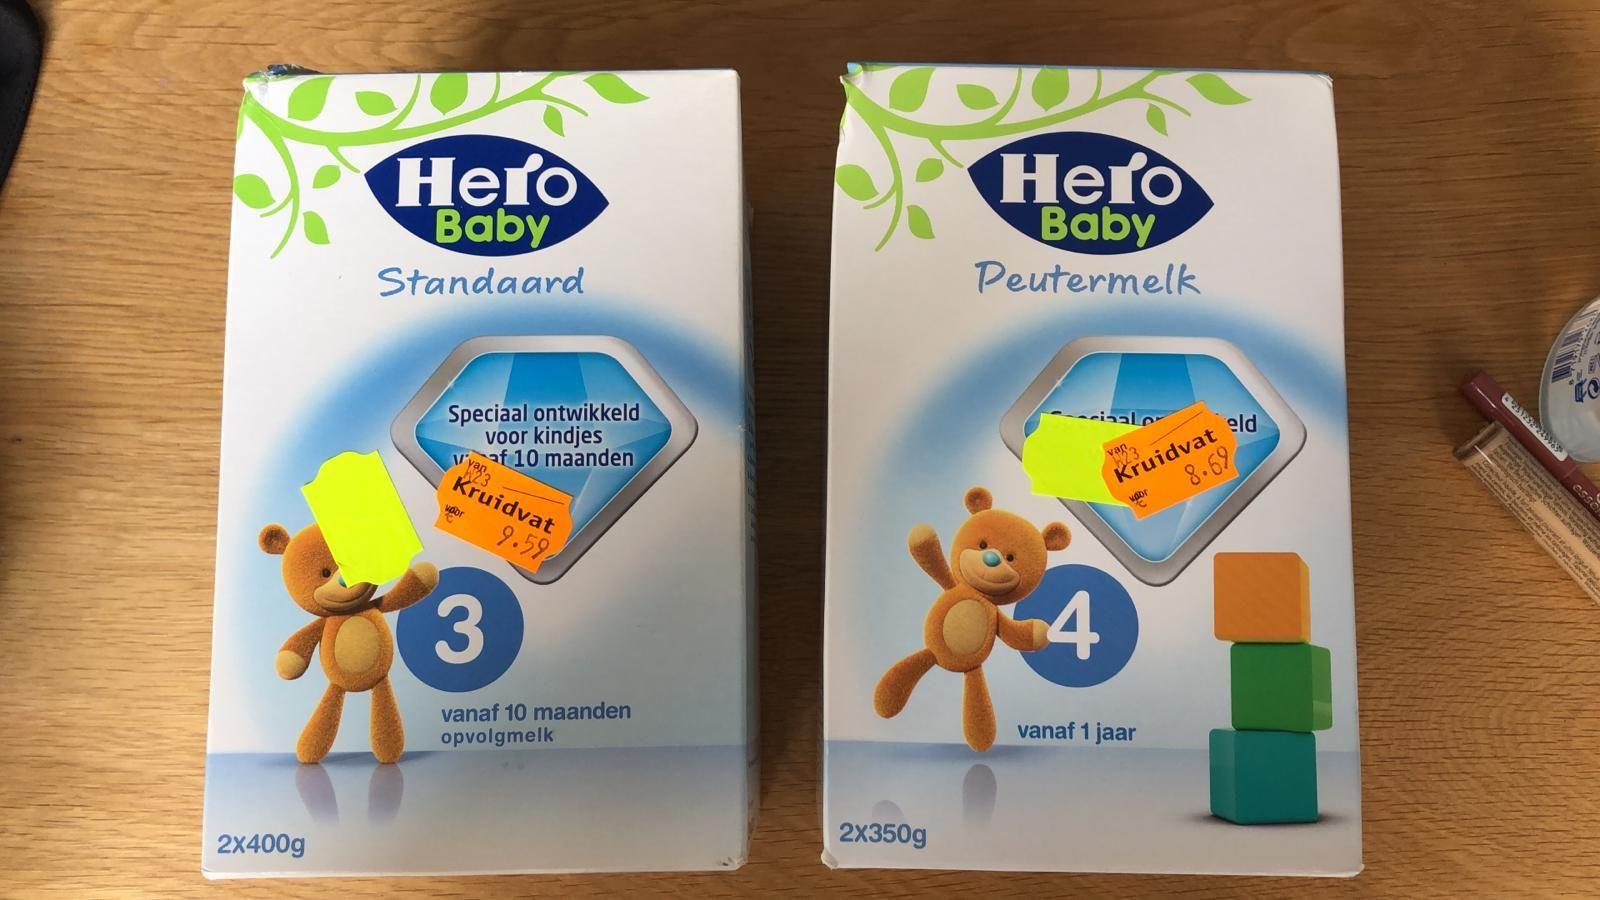 Hero Babyvoeding Flesvoeding -50% bij Kruidvat